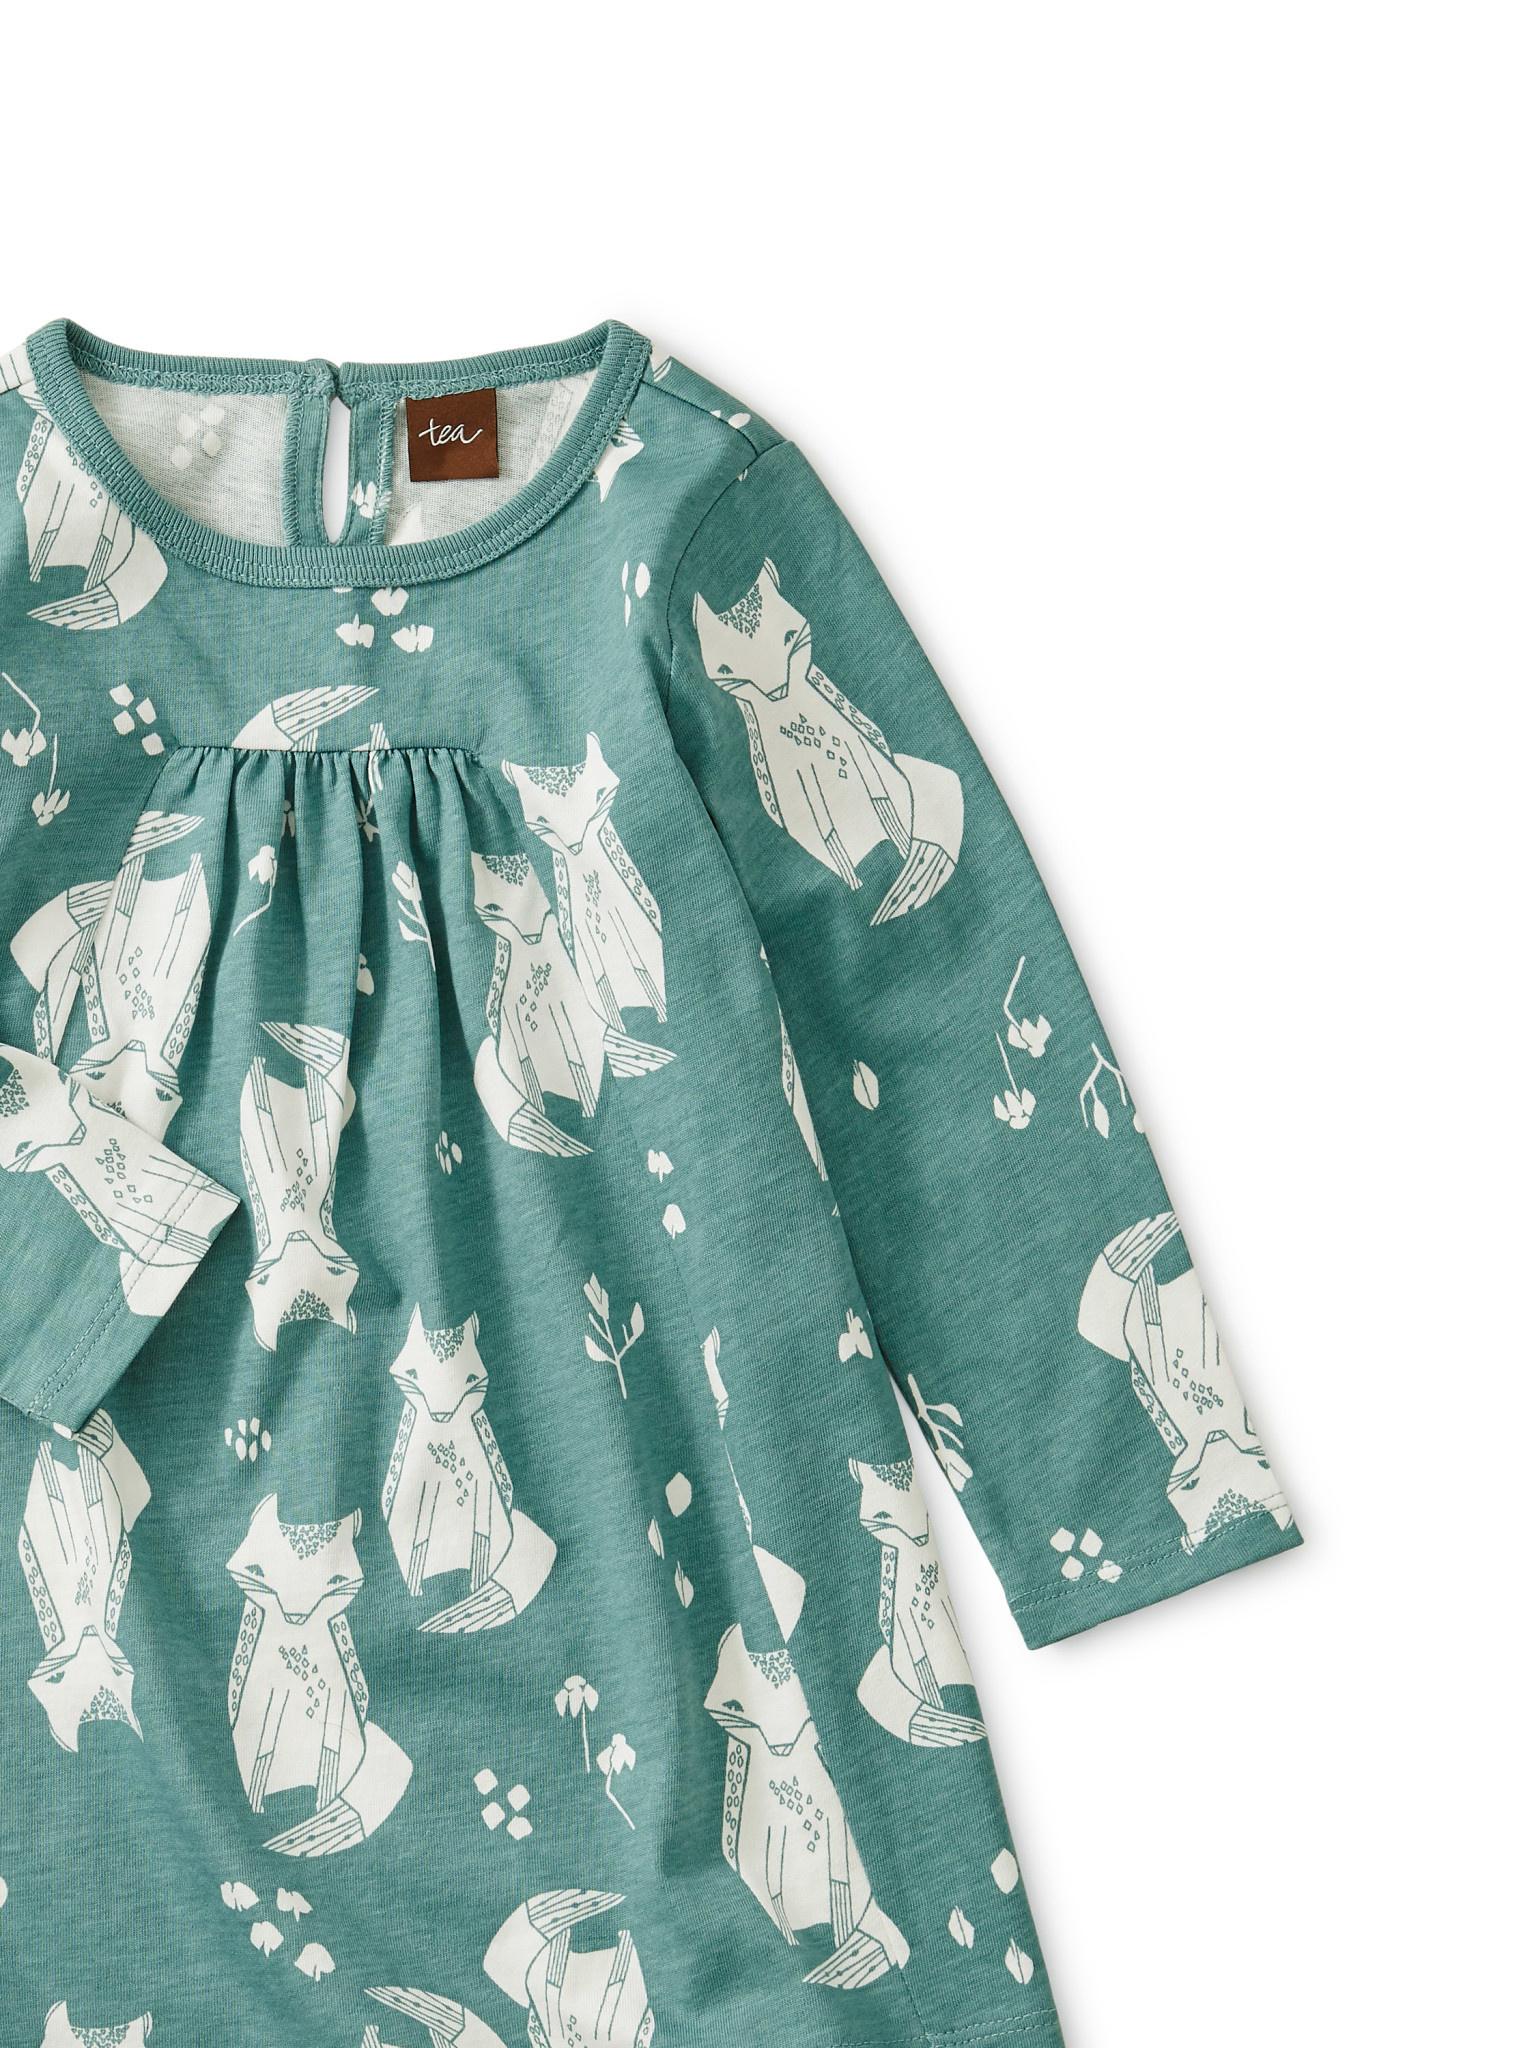 Tea Collection Sand Fox Pleated Baby Dress